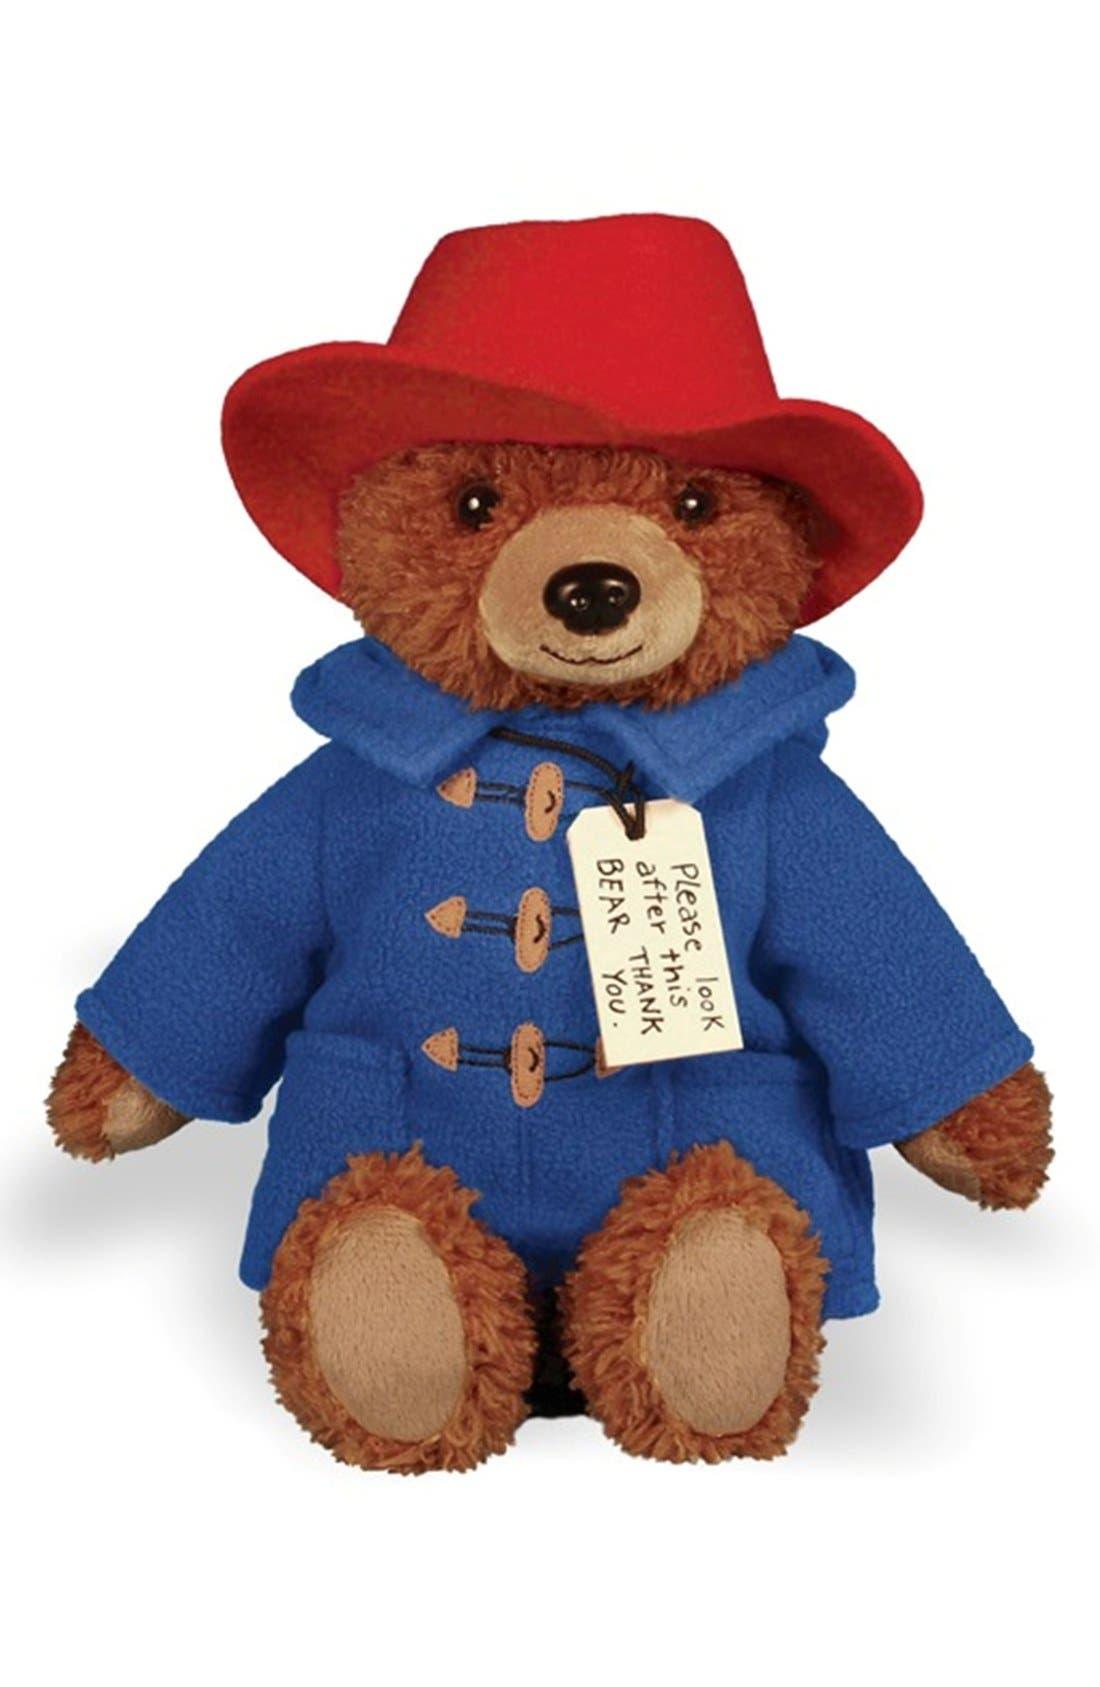 Alternate Image 1 Selected - yOttOy Paddington Bear™ Stuffed Animal